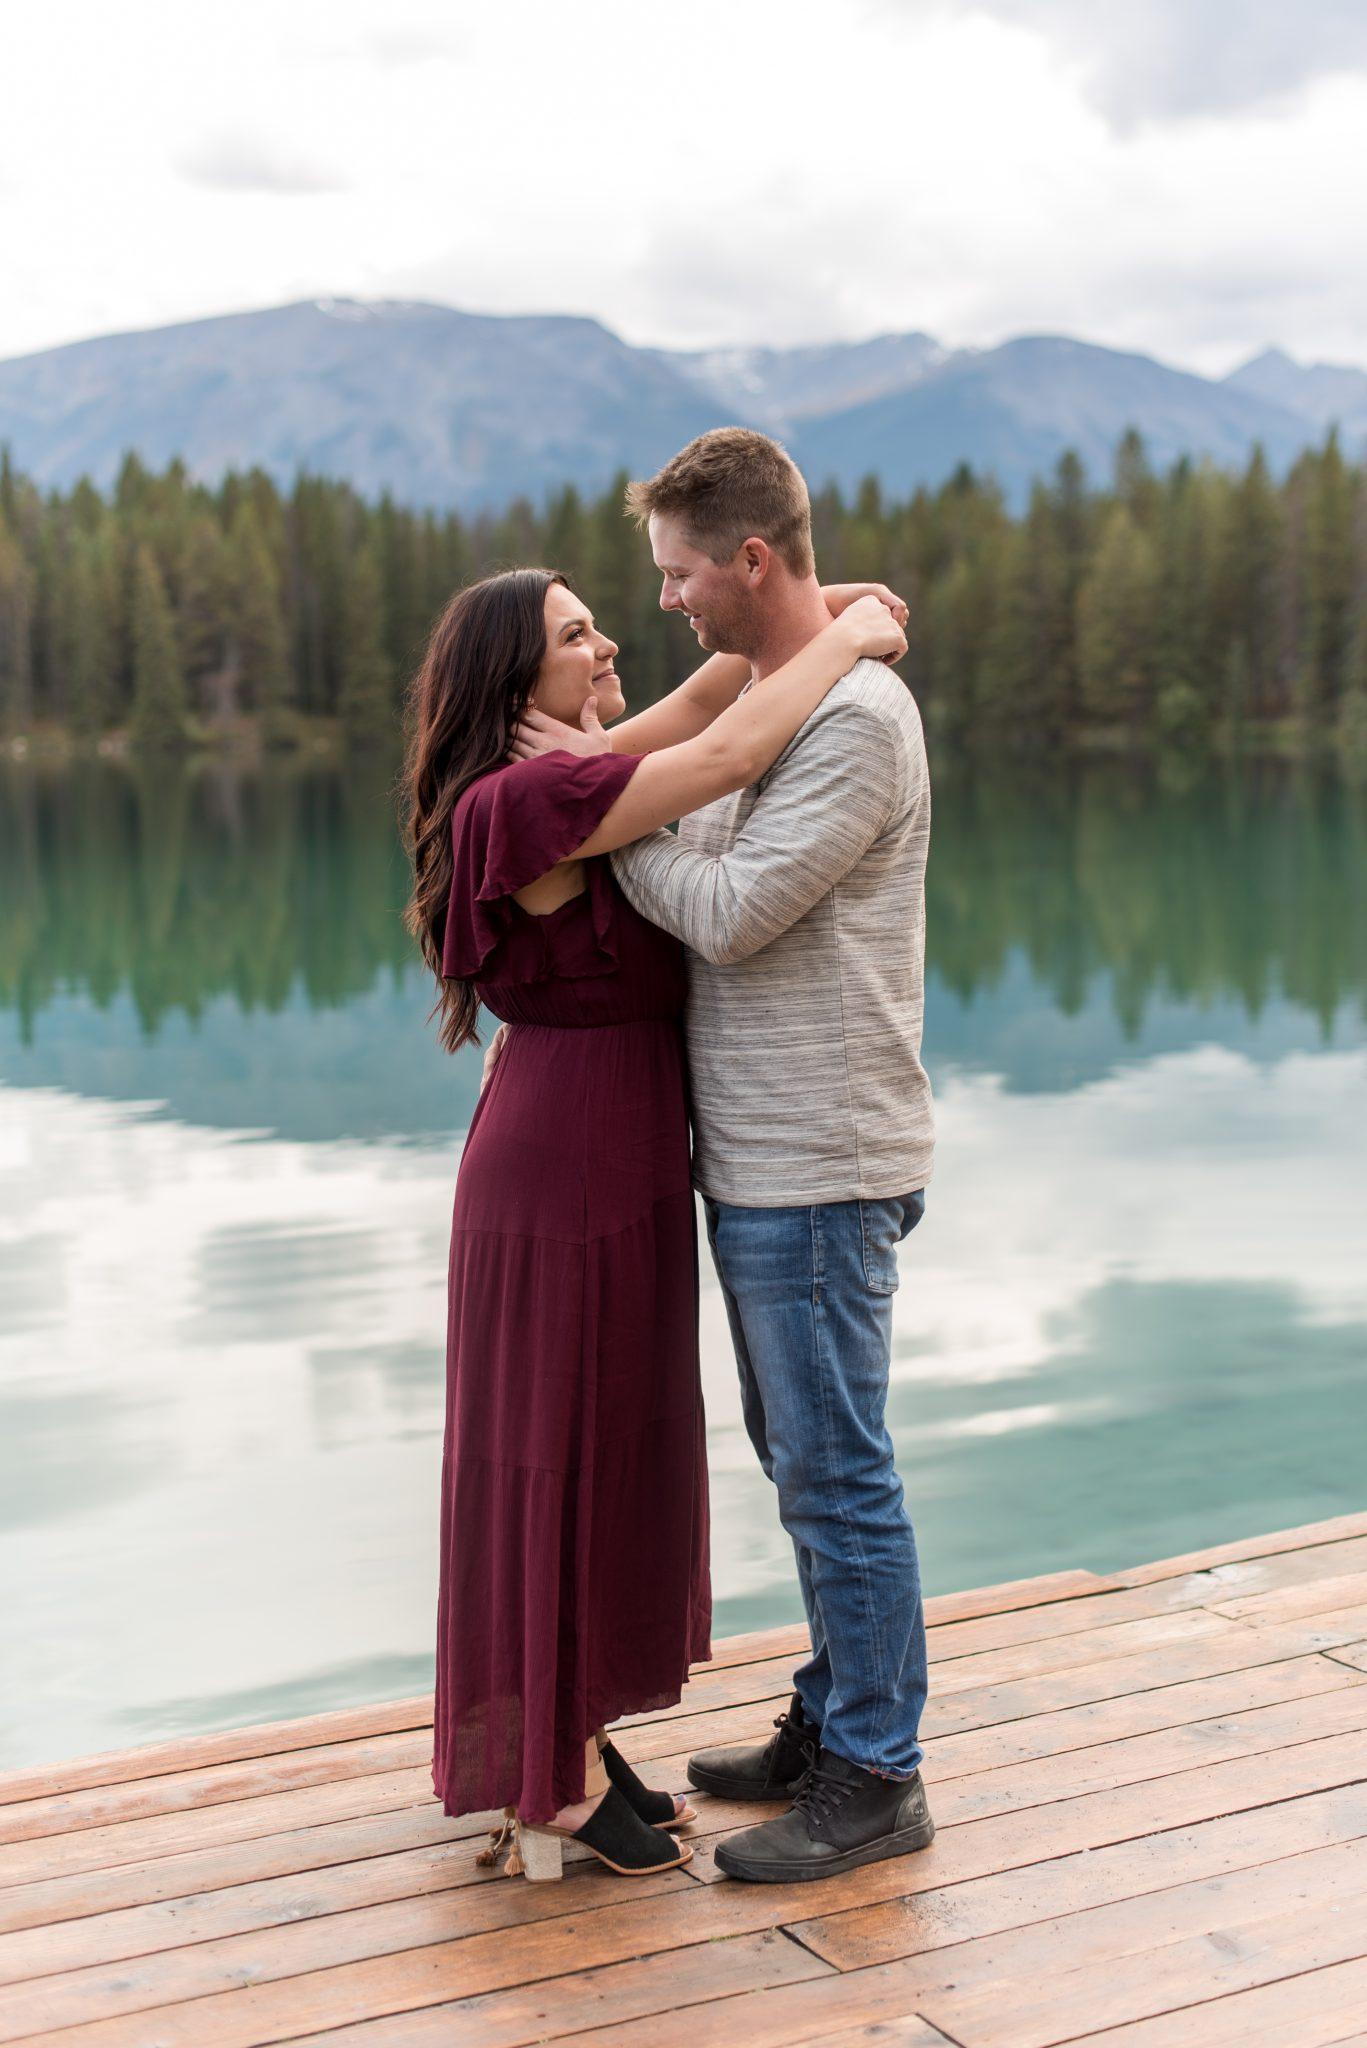 Engagement photos at Lake Annette in Jasper National Park